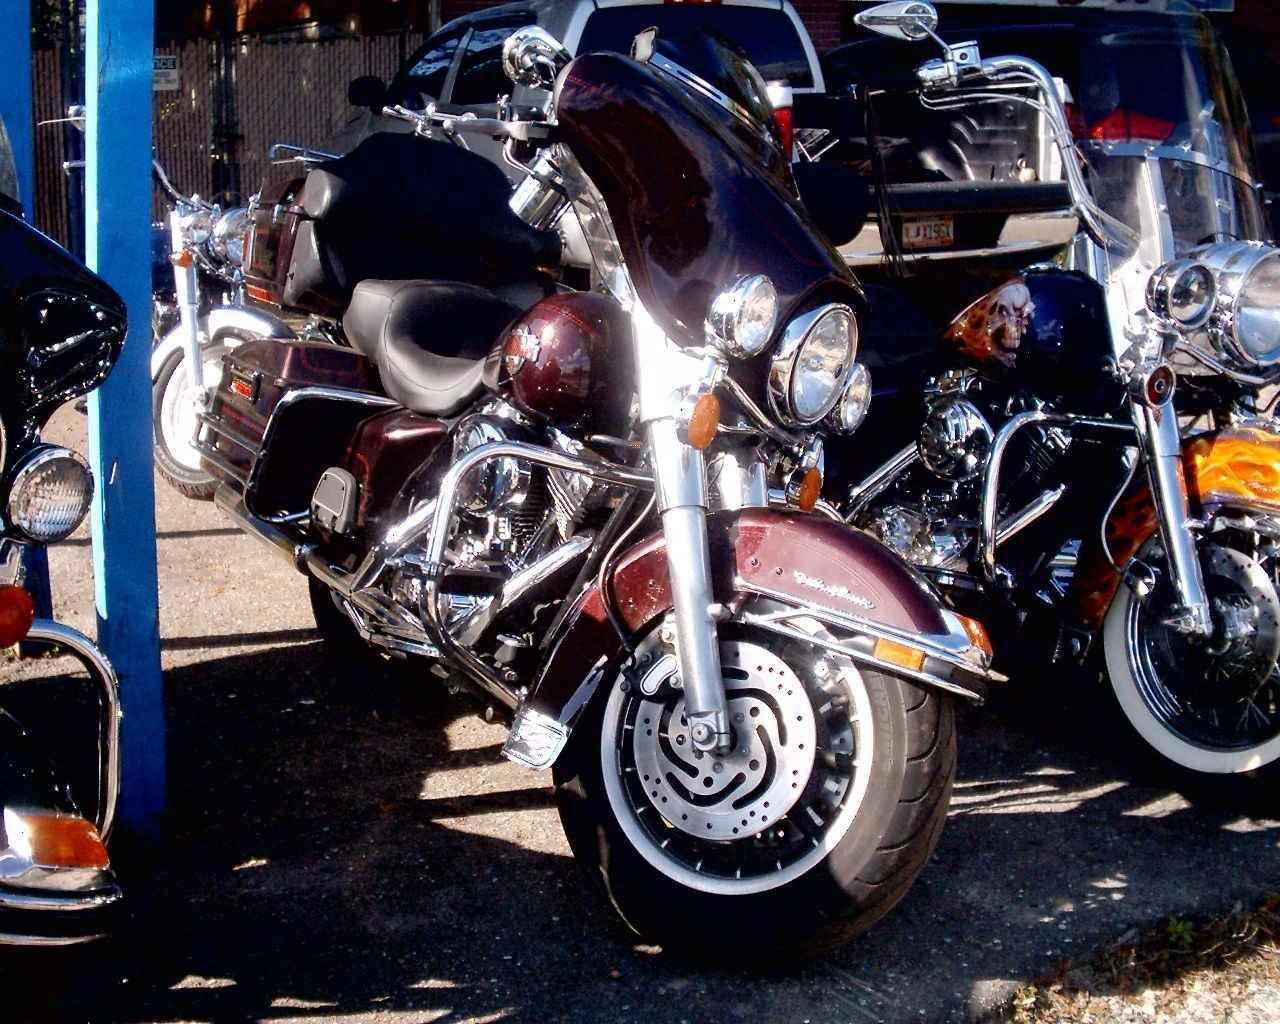 2006 Harley Davidson Electra Glide Classic Flhtcui Harley Davidson Electra Glide Electra Glide Classic Harley Davidson [ 1024 x 1280 Pixel ]